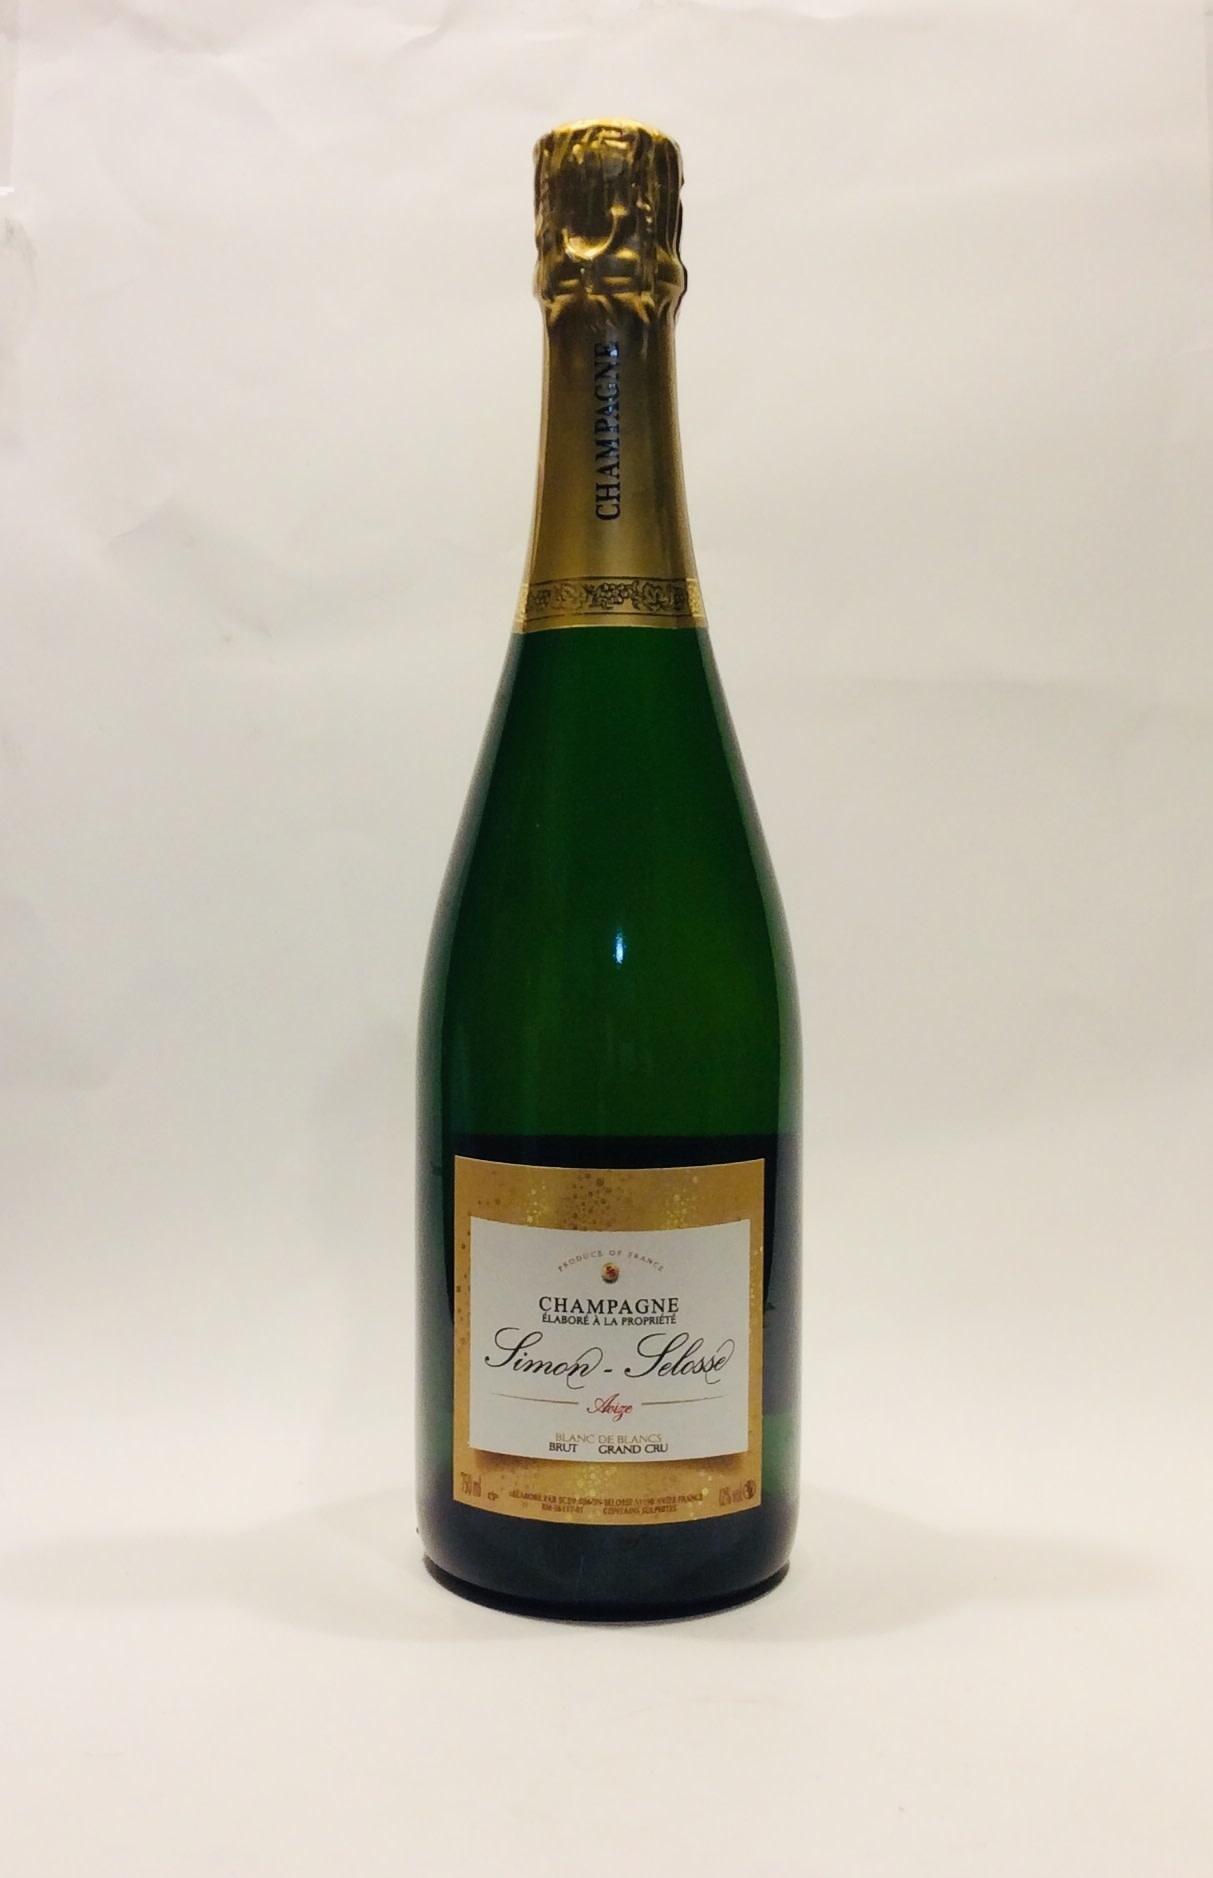 France Simon Selosse Champagne Grand Cru Blanc de Blamc